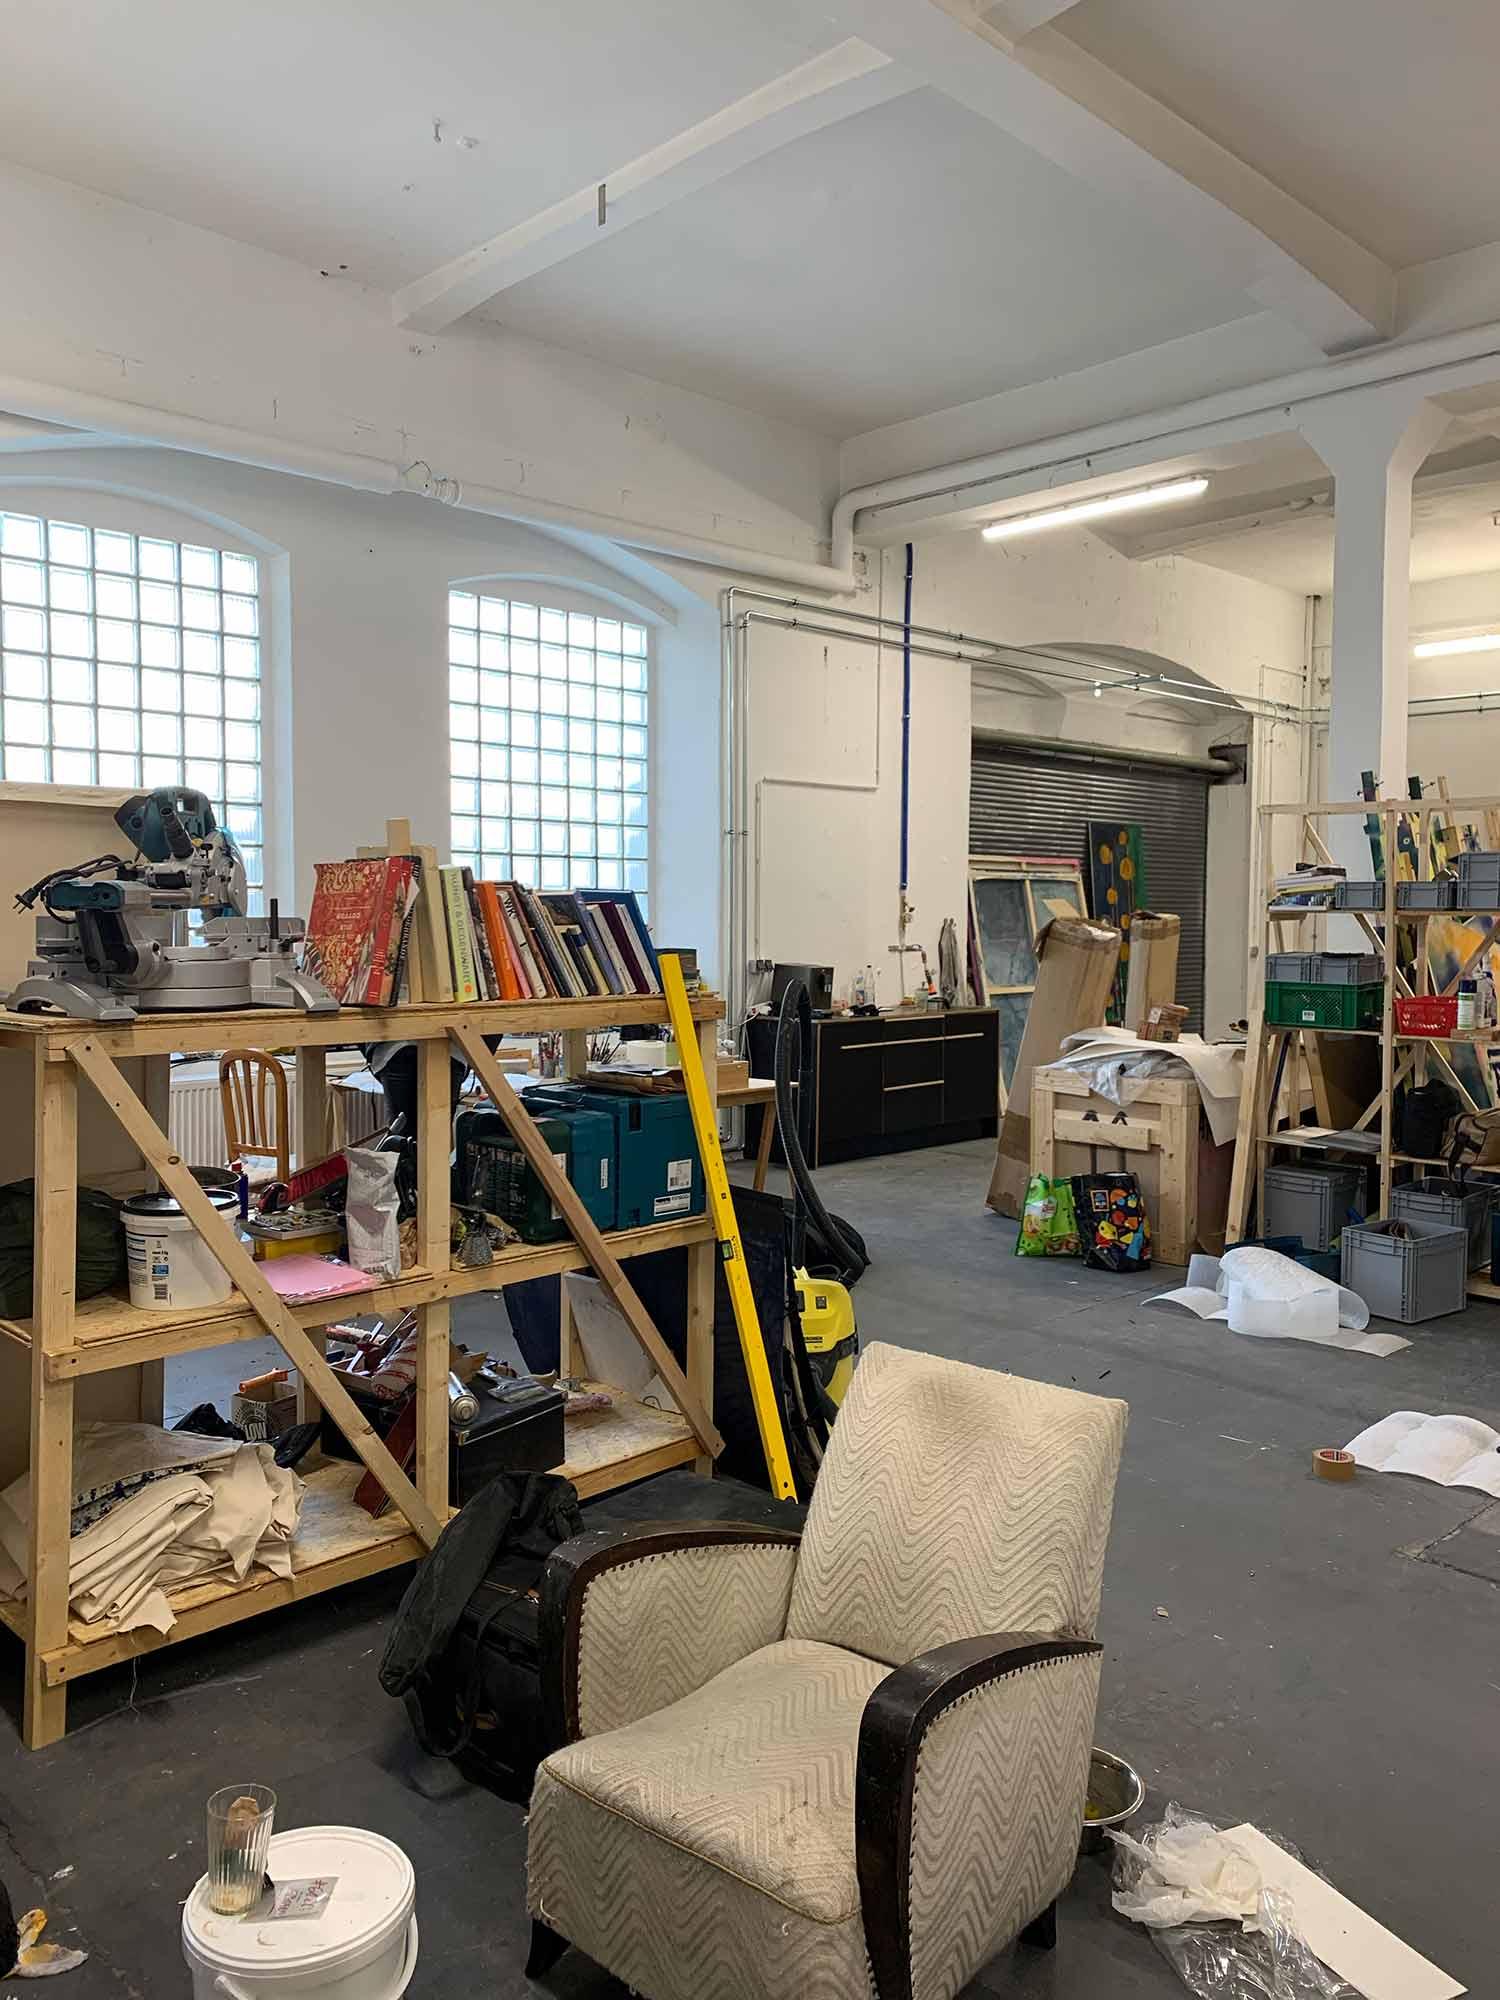 art field, artlovers, wall decor, anthropology, ad magazine, fresh, platform,